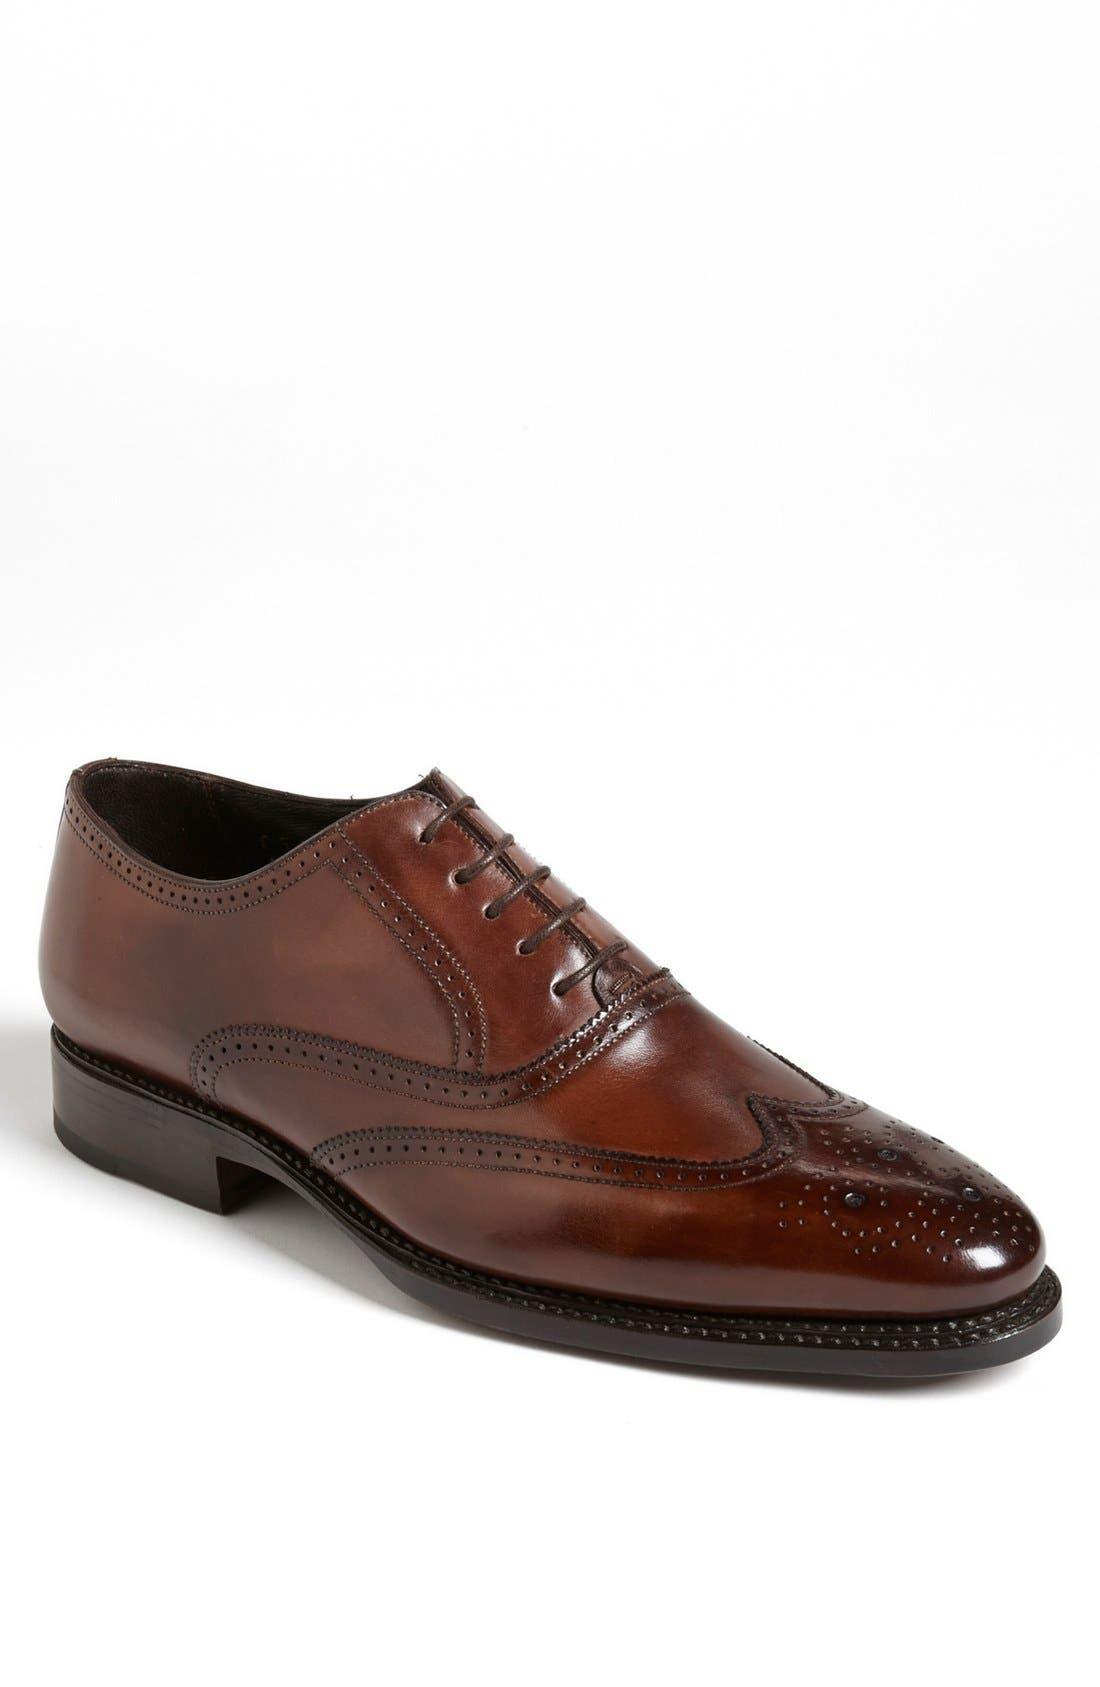 Main Image - Canali Leather Wingtip (Men)